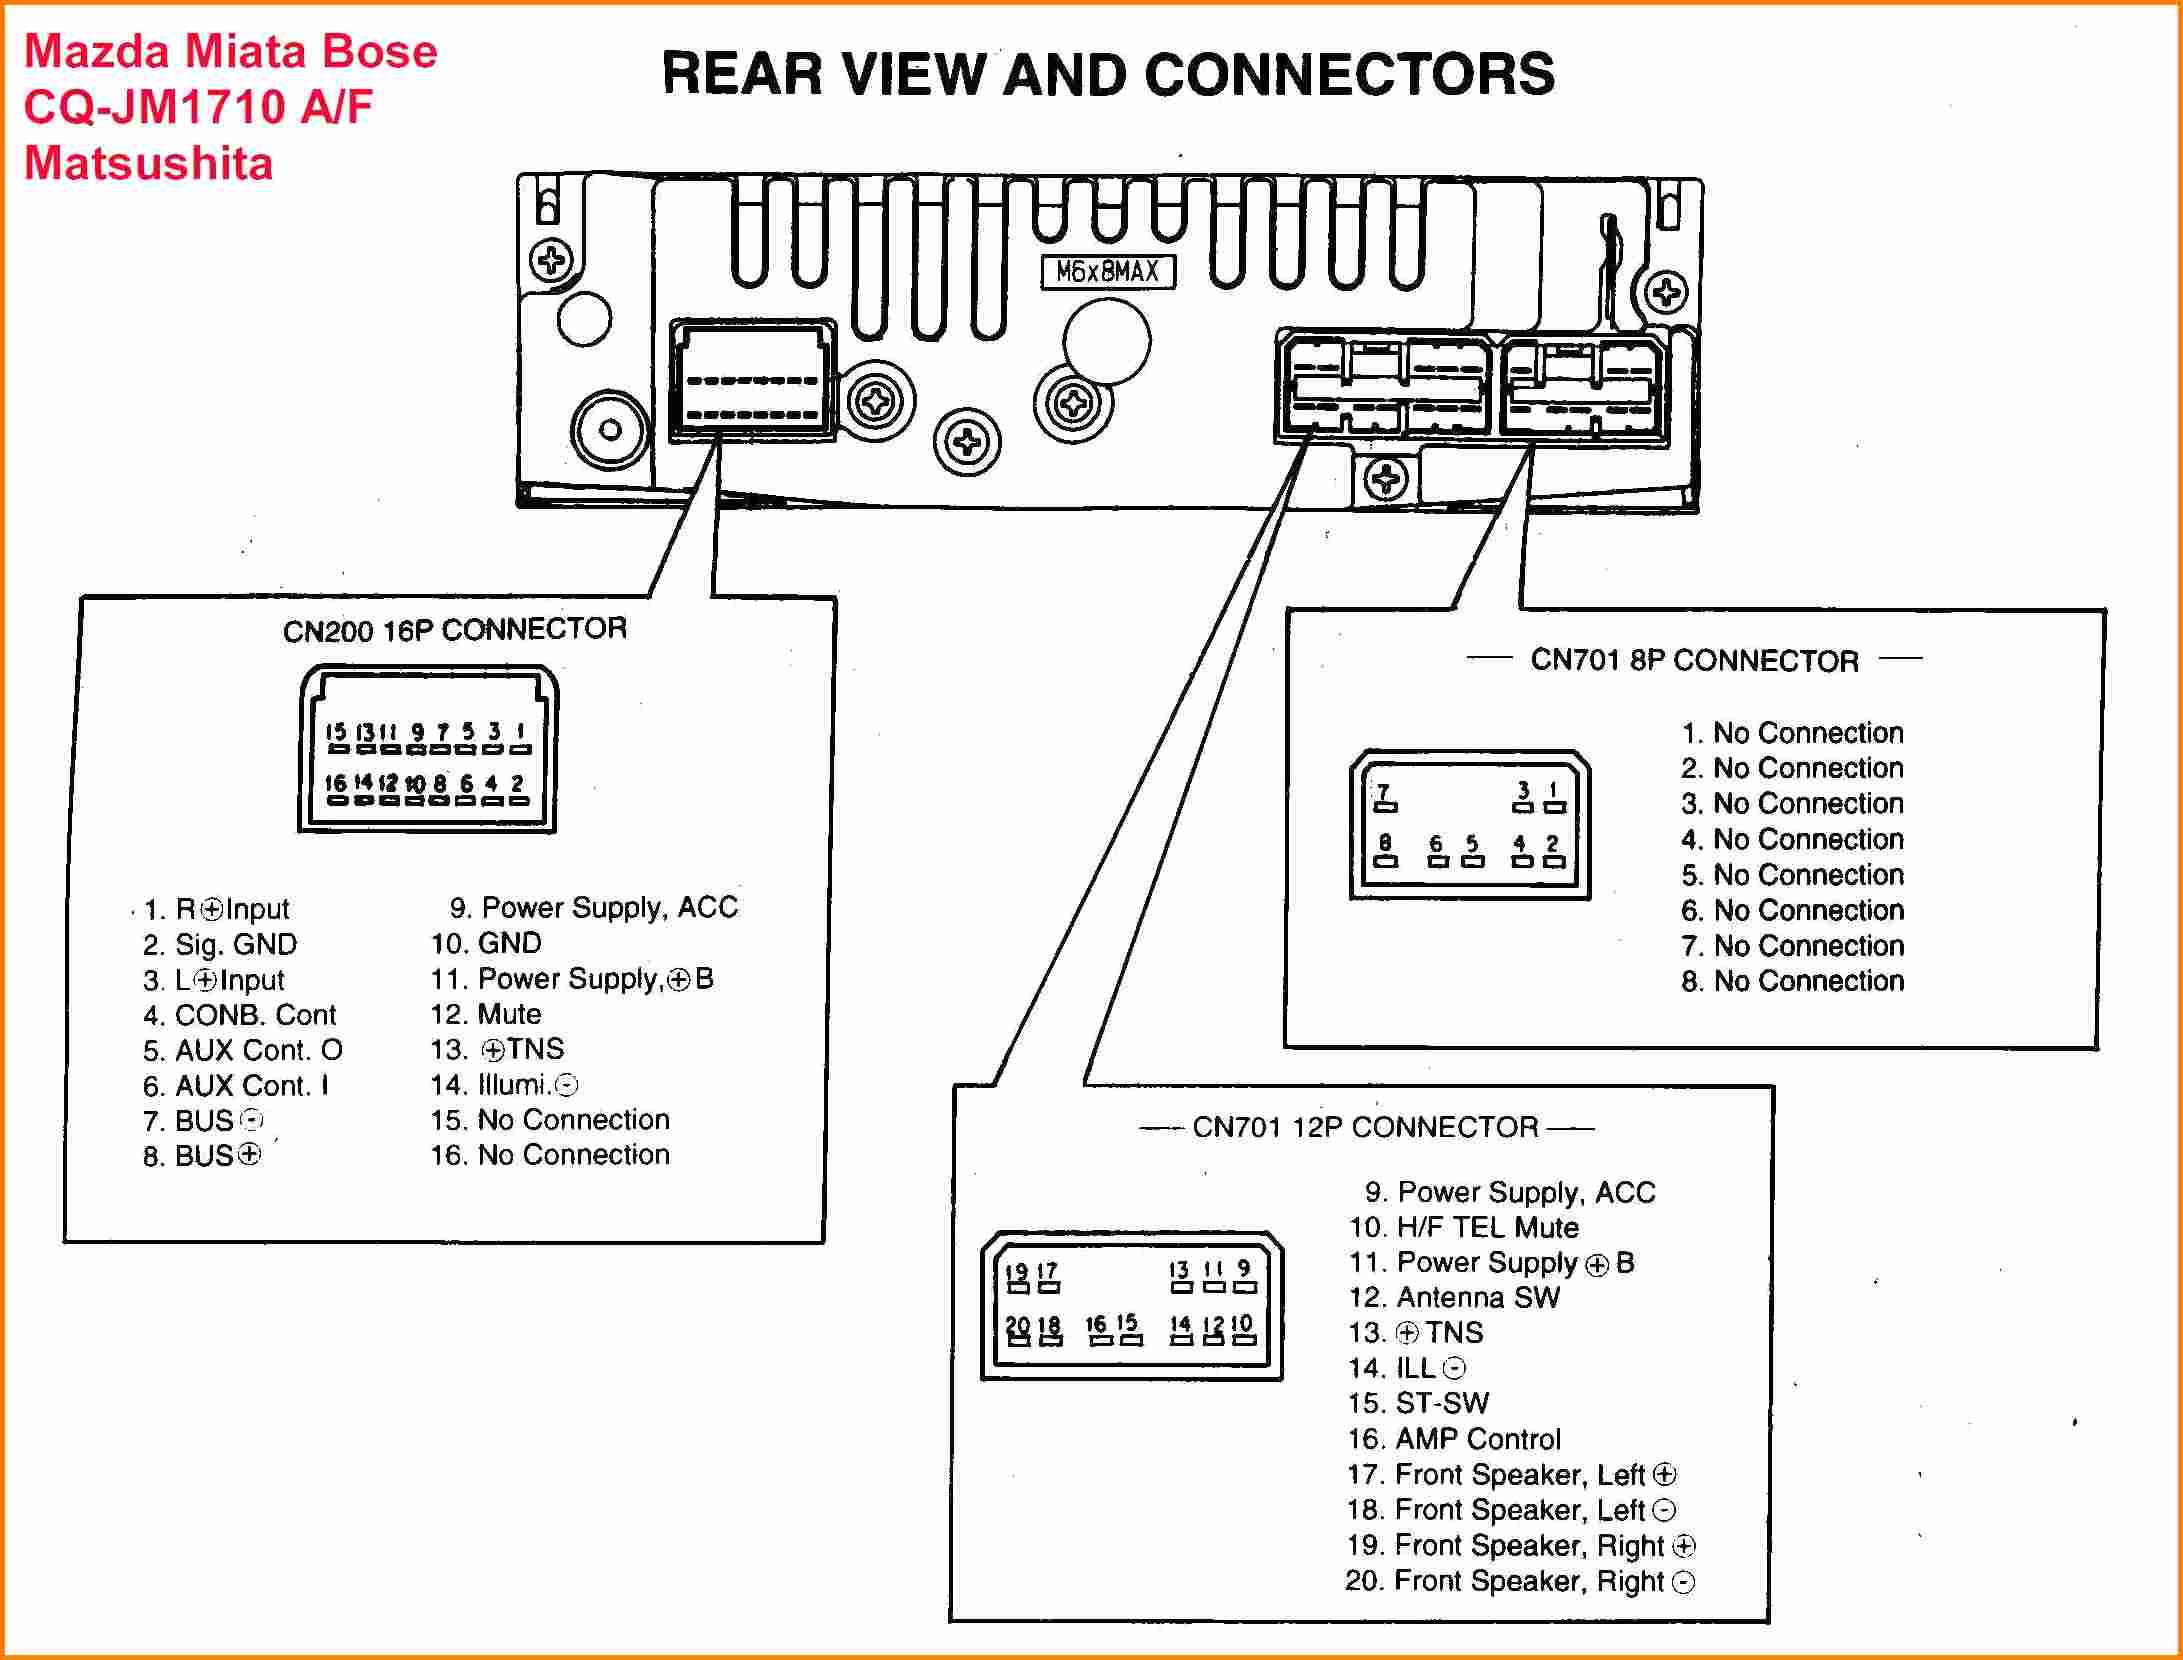 Wiring Diagram Pioneer Deh X1810Ub Manual Fabulous Striking 4300Ub - Pioneer Deh-X1810Ub Wiring Diagram